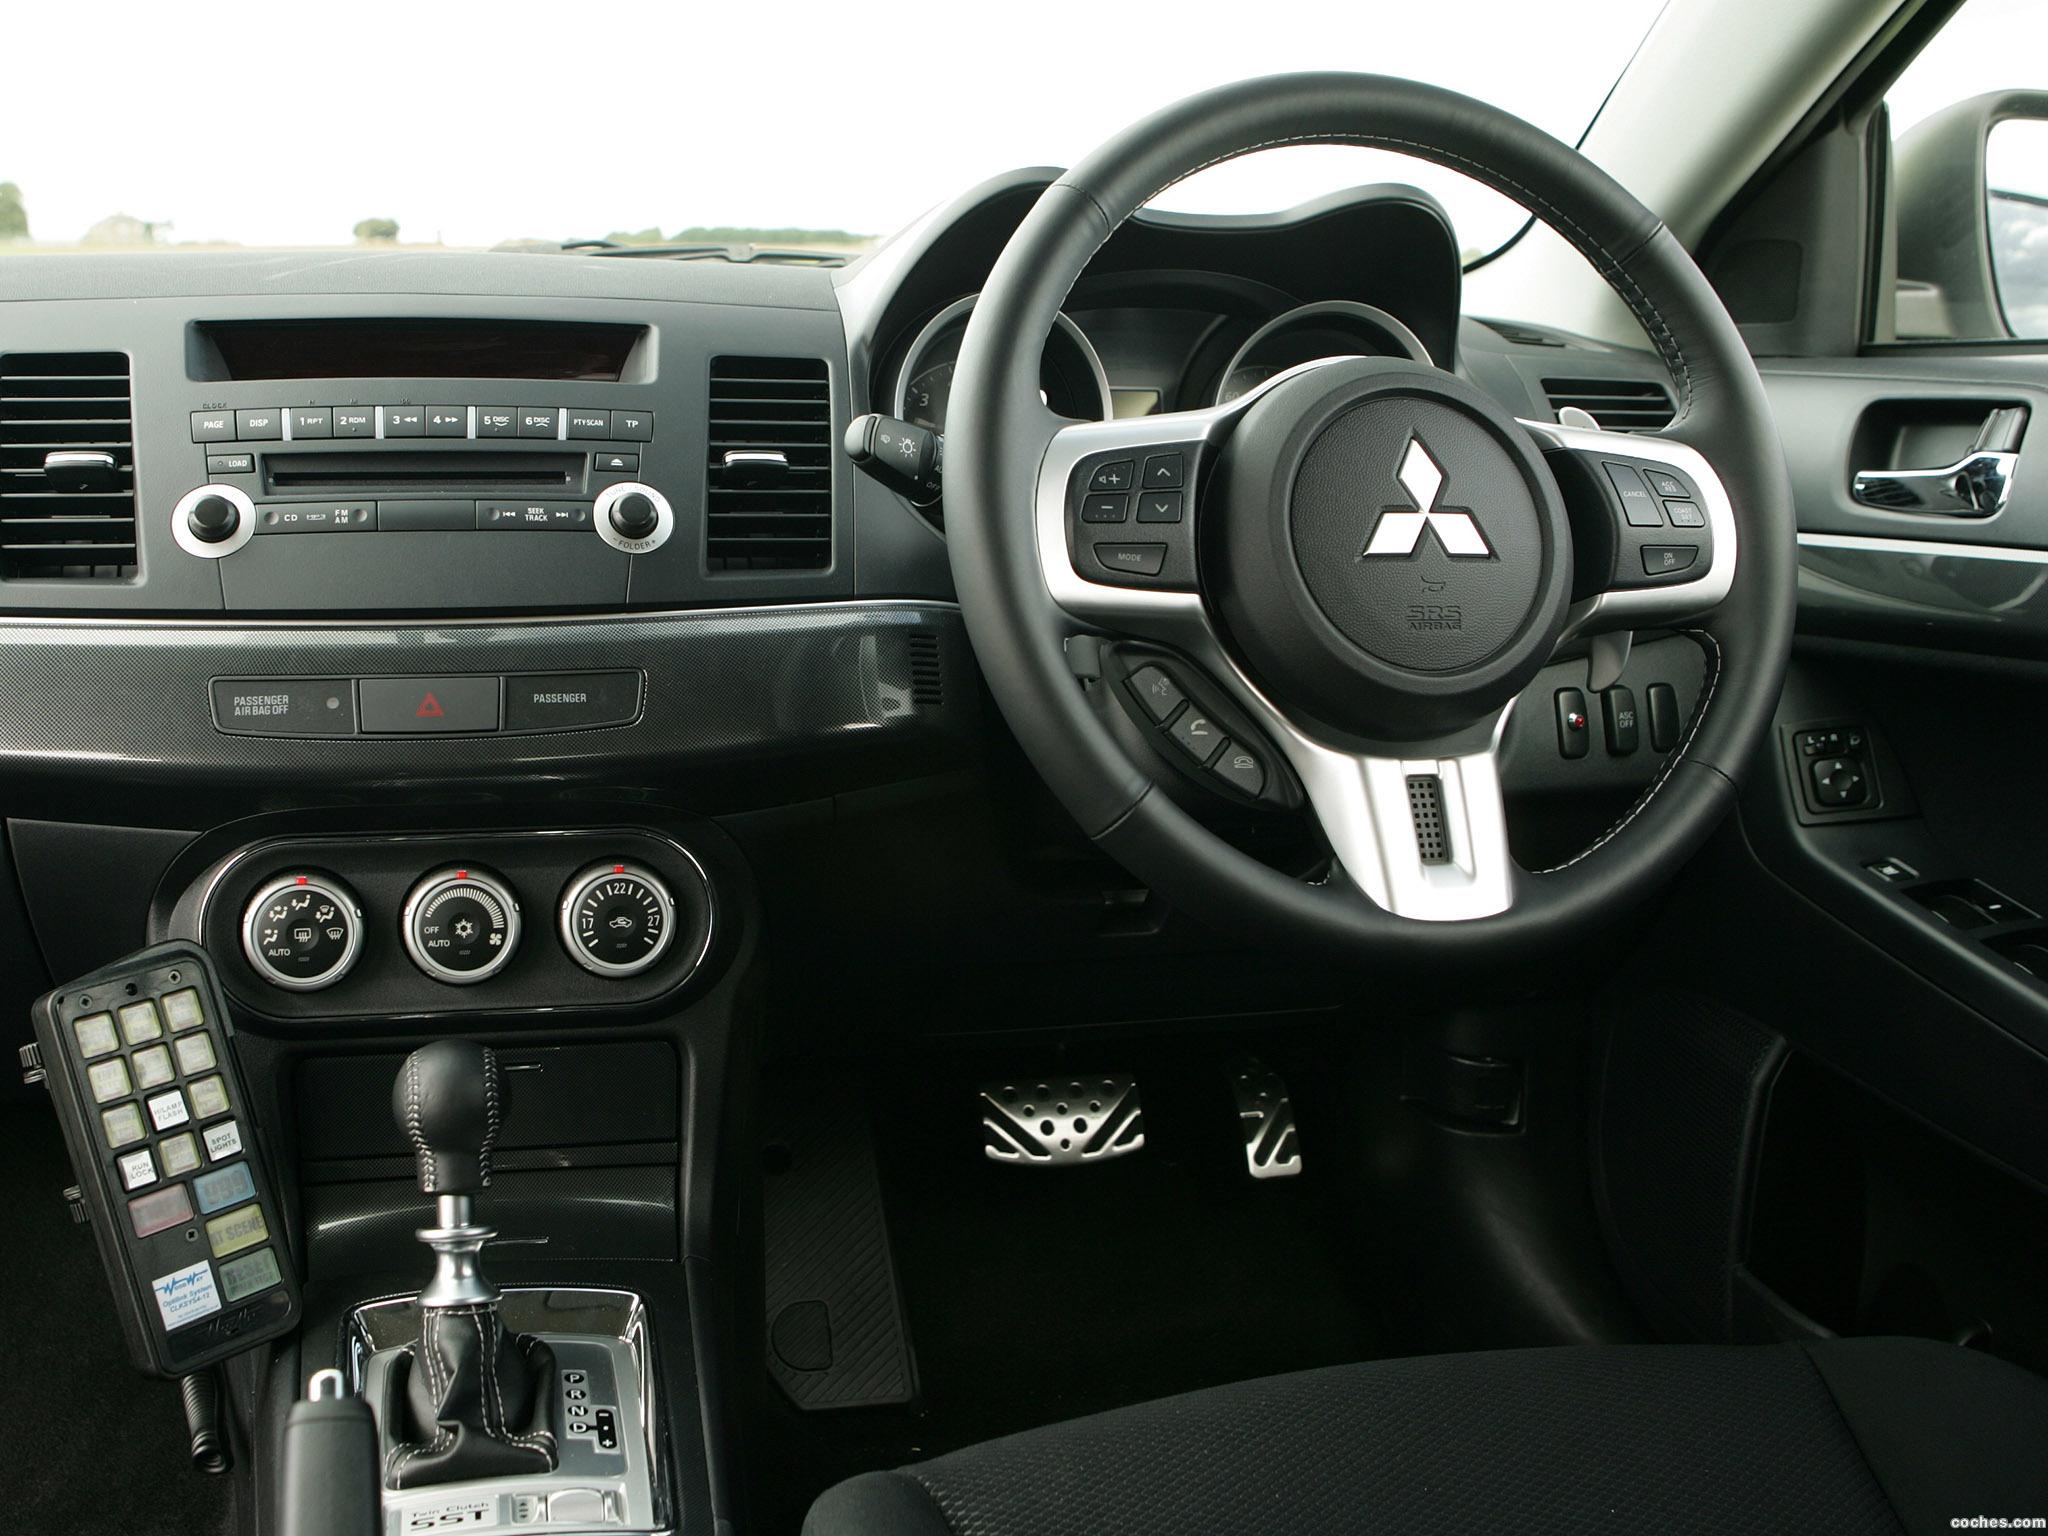 Foto 10 de Mitsubishi Lancer Sportback UK Police 2009